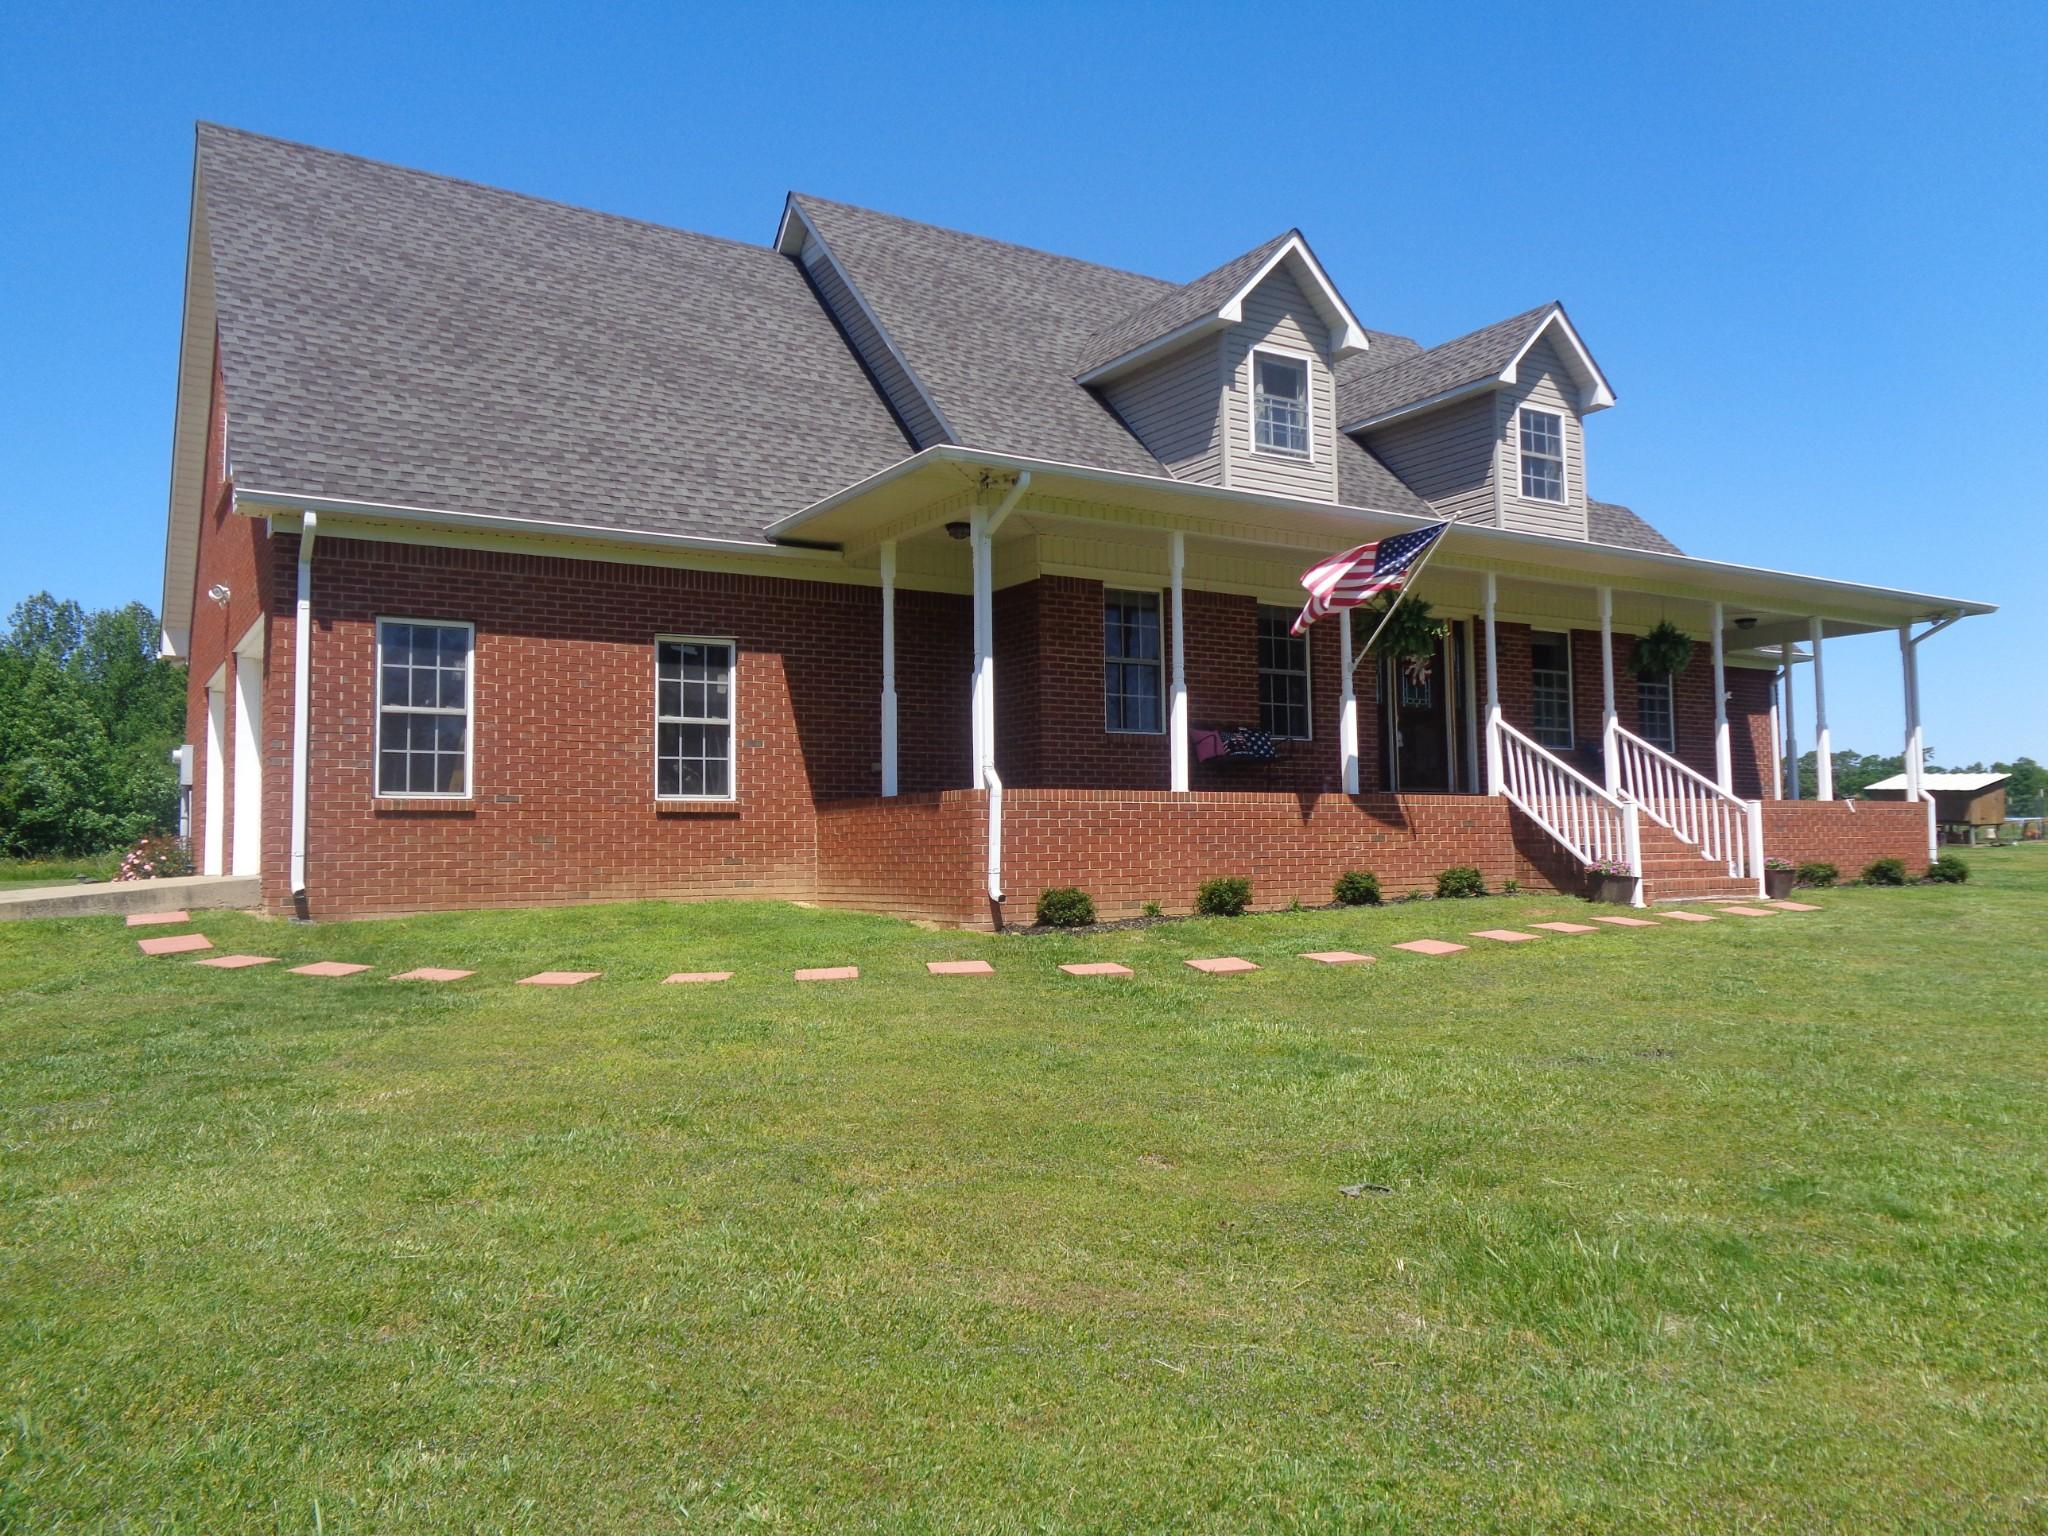 77 Fullers Chapel Rd, Leoma, TN 38468 - Leoma, TN real estate listing